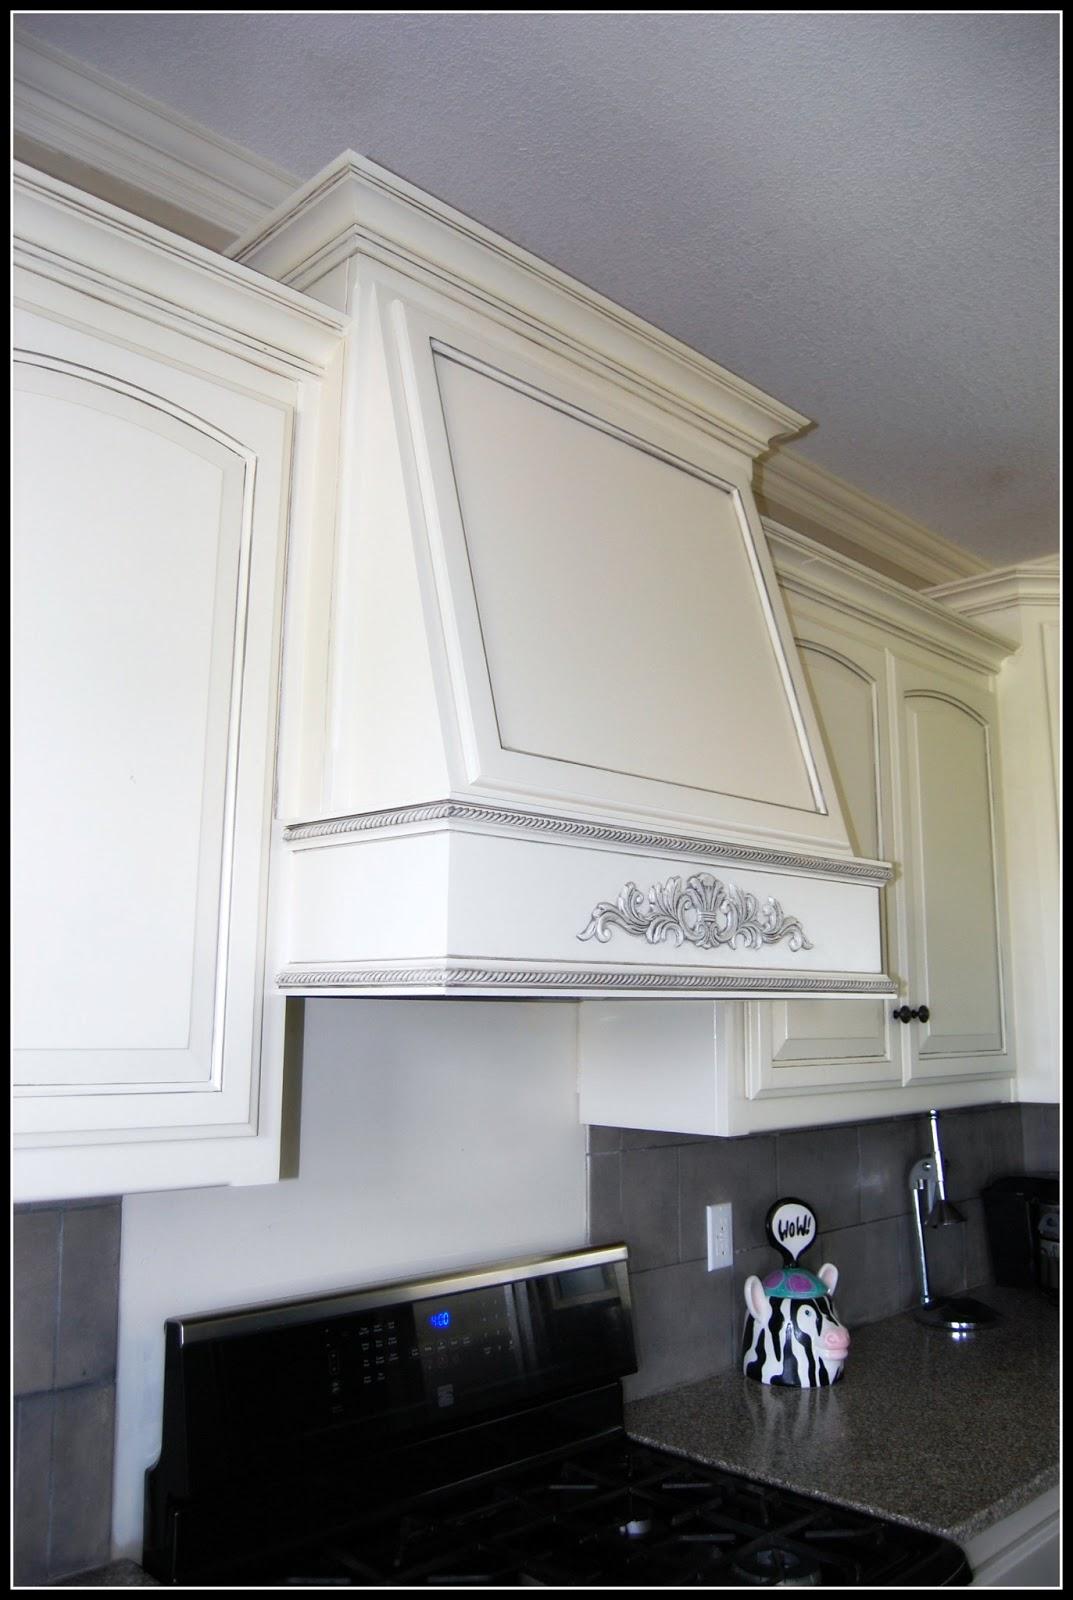 kcfauxdesign.com: DIY Decorative Hood Range Vent